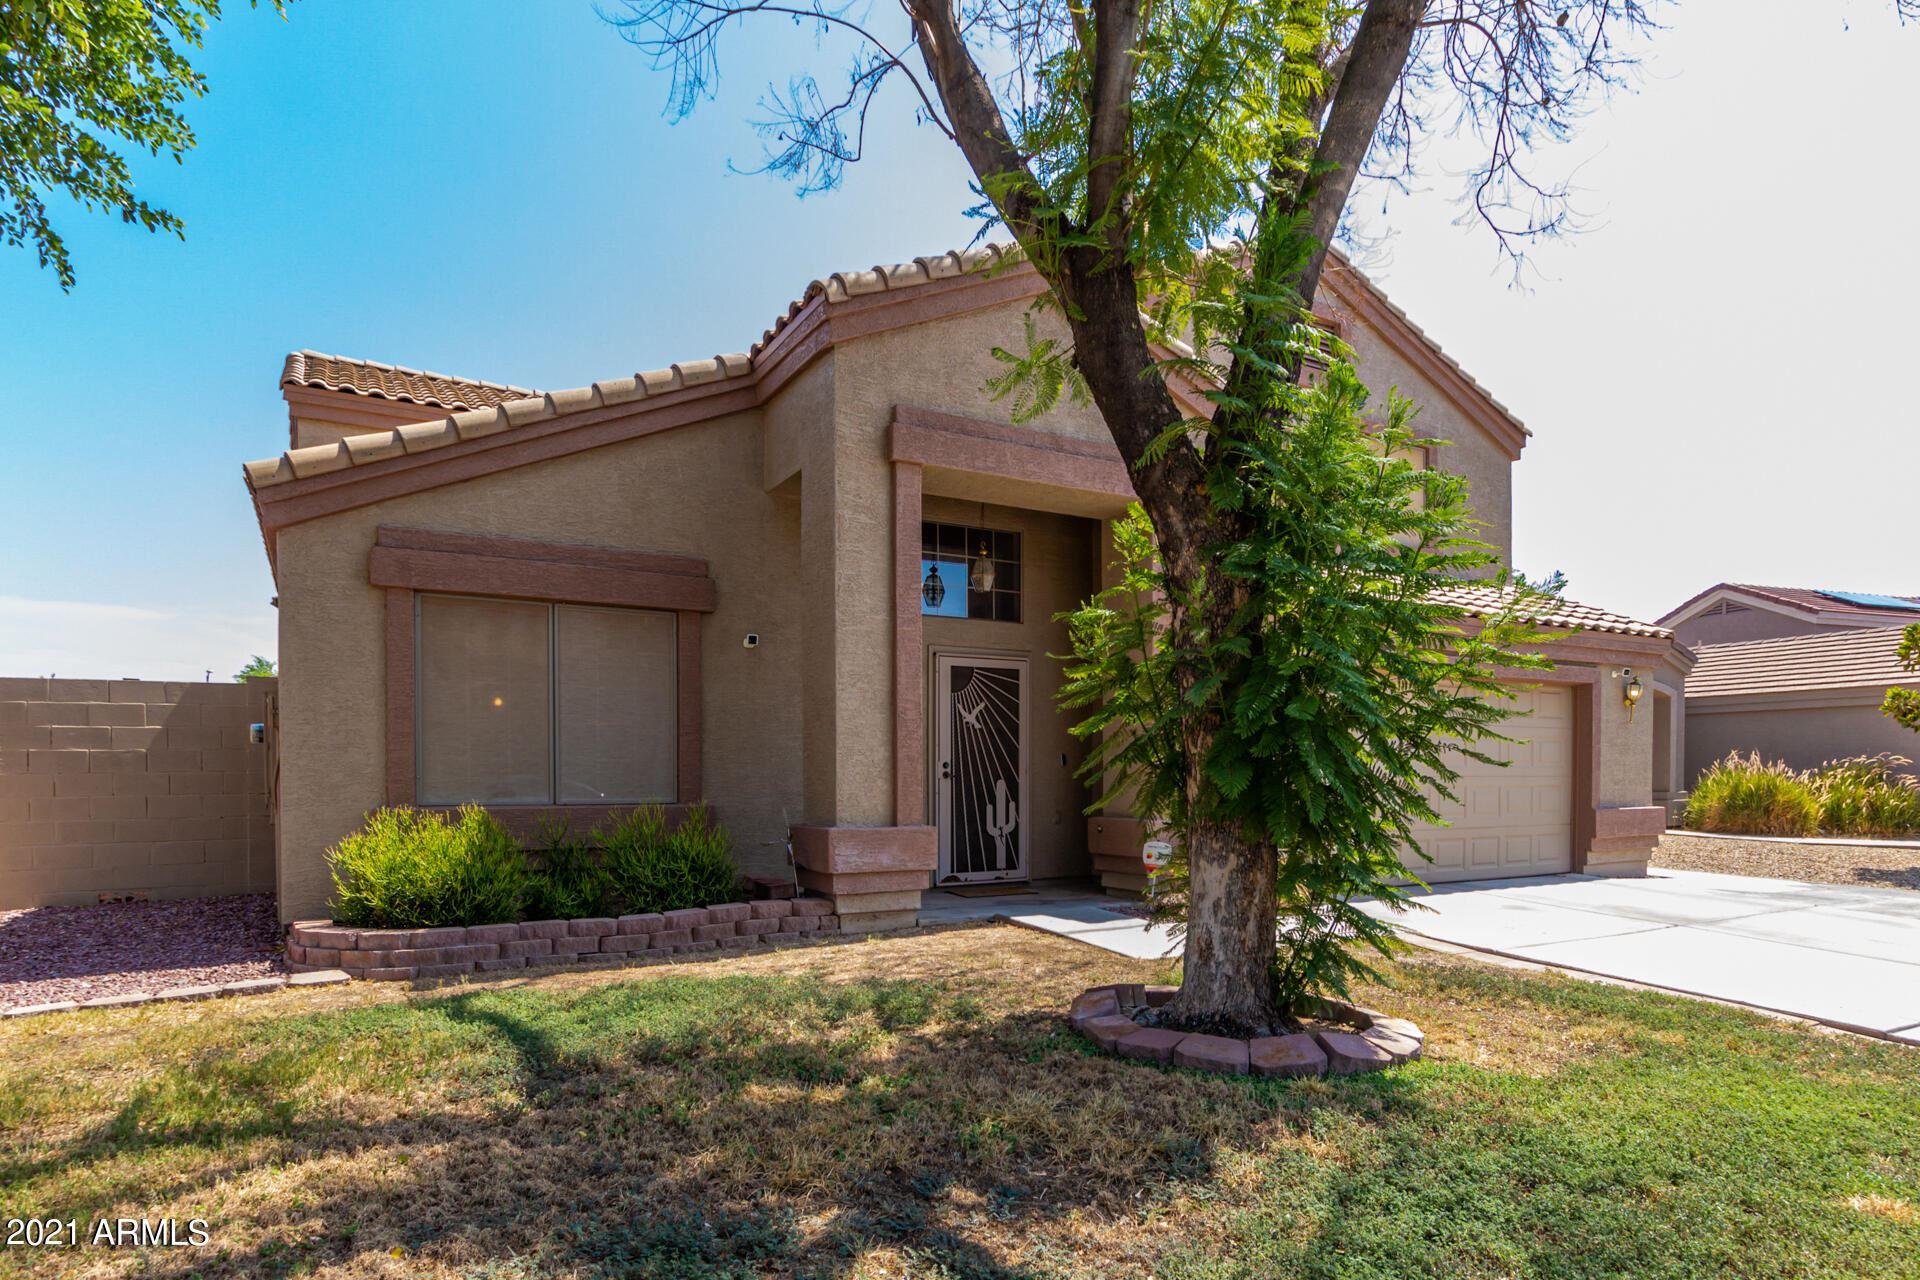 Photo of 12913 W CROCUS Drive, El Mirage, AZ 85335 (MLS # 6266160)